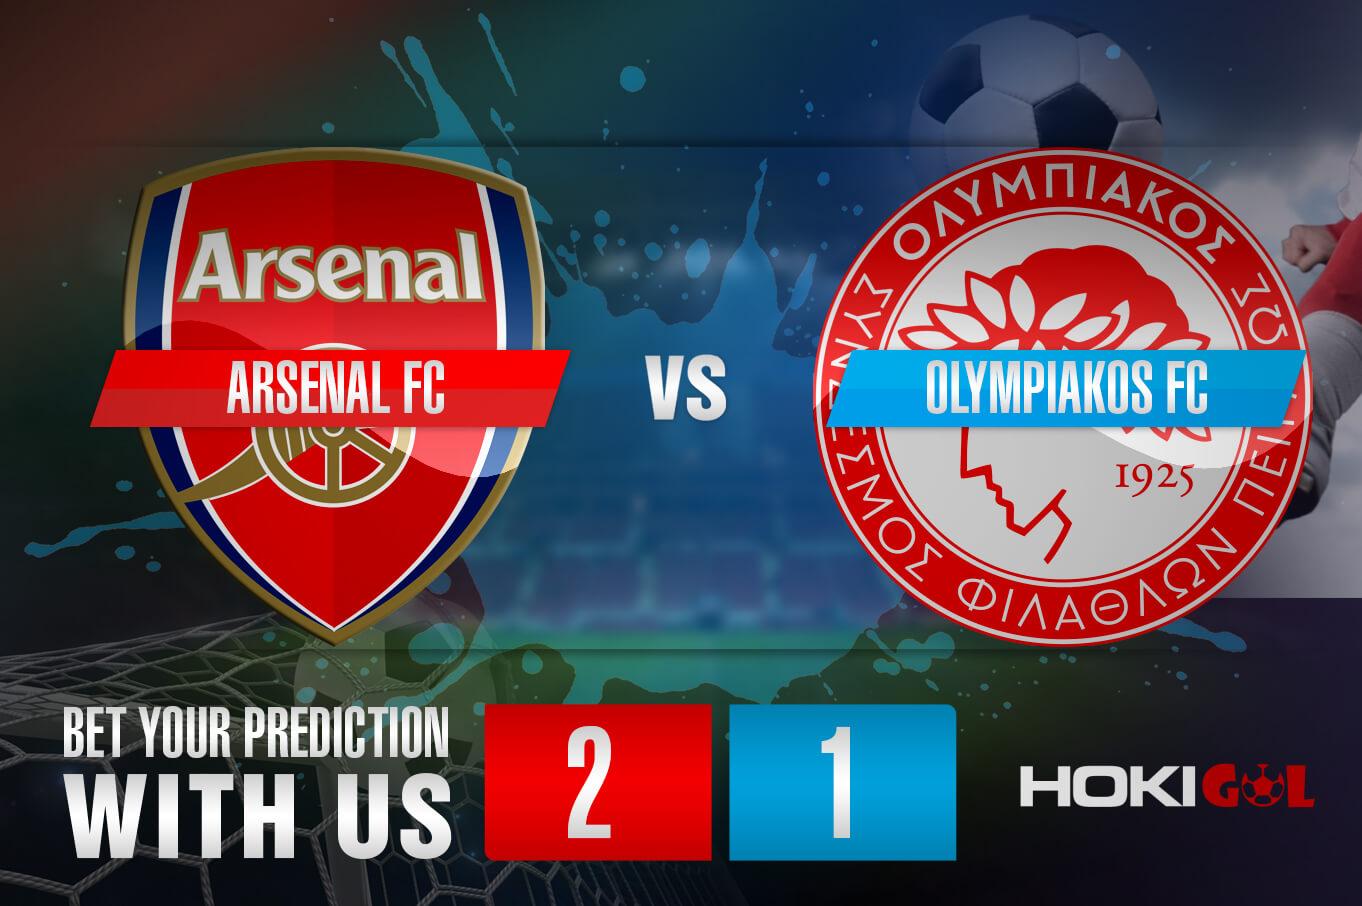 Prediksi Bola Arsenal FC Vs Olympiakos FC 19 Maret 2021